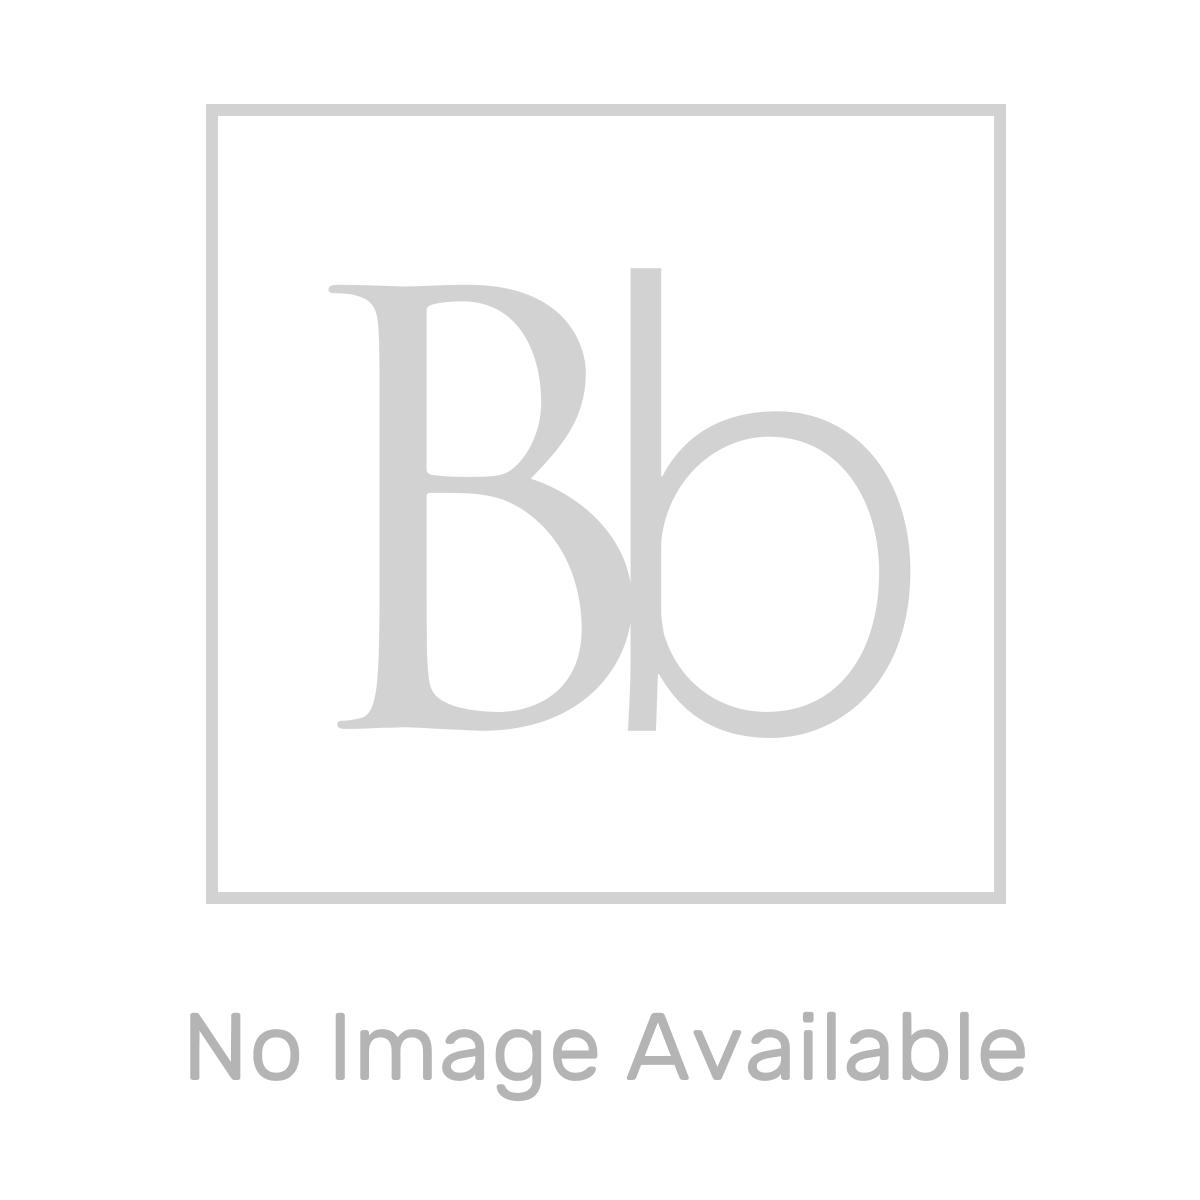 RAK Sensation Gloss White Counter Top Basin 600mm Measurements